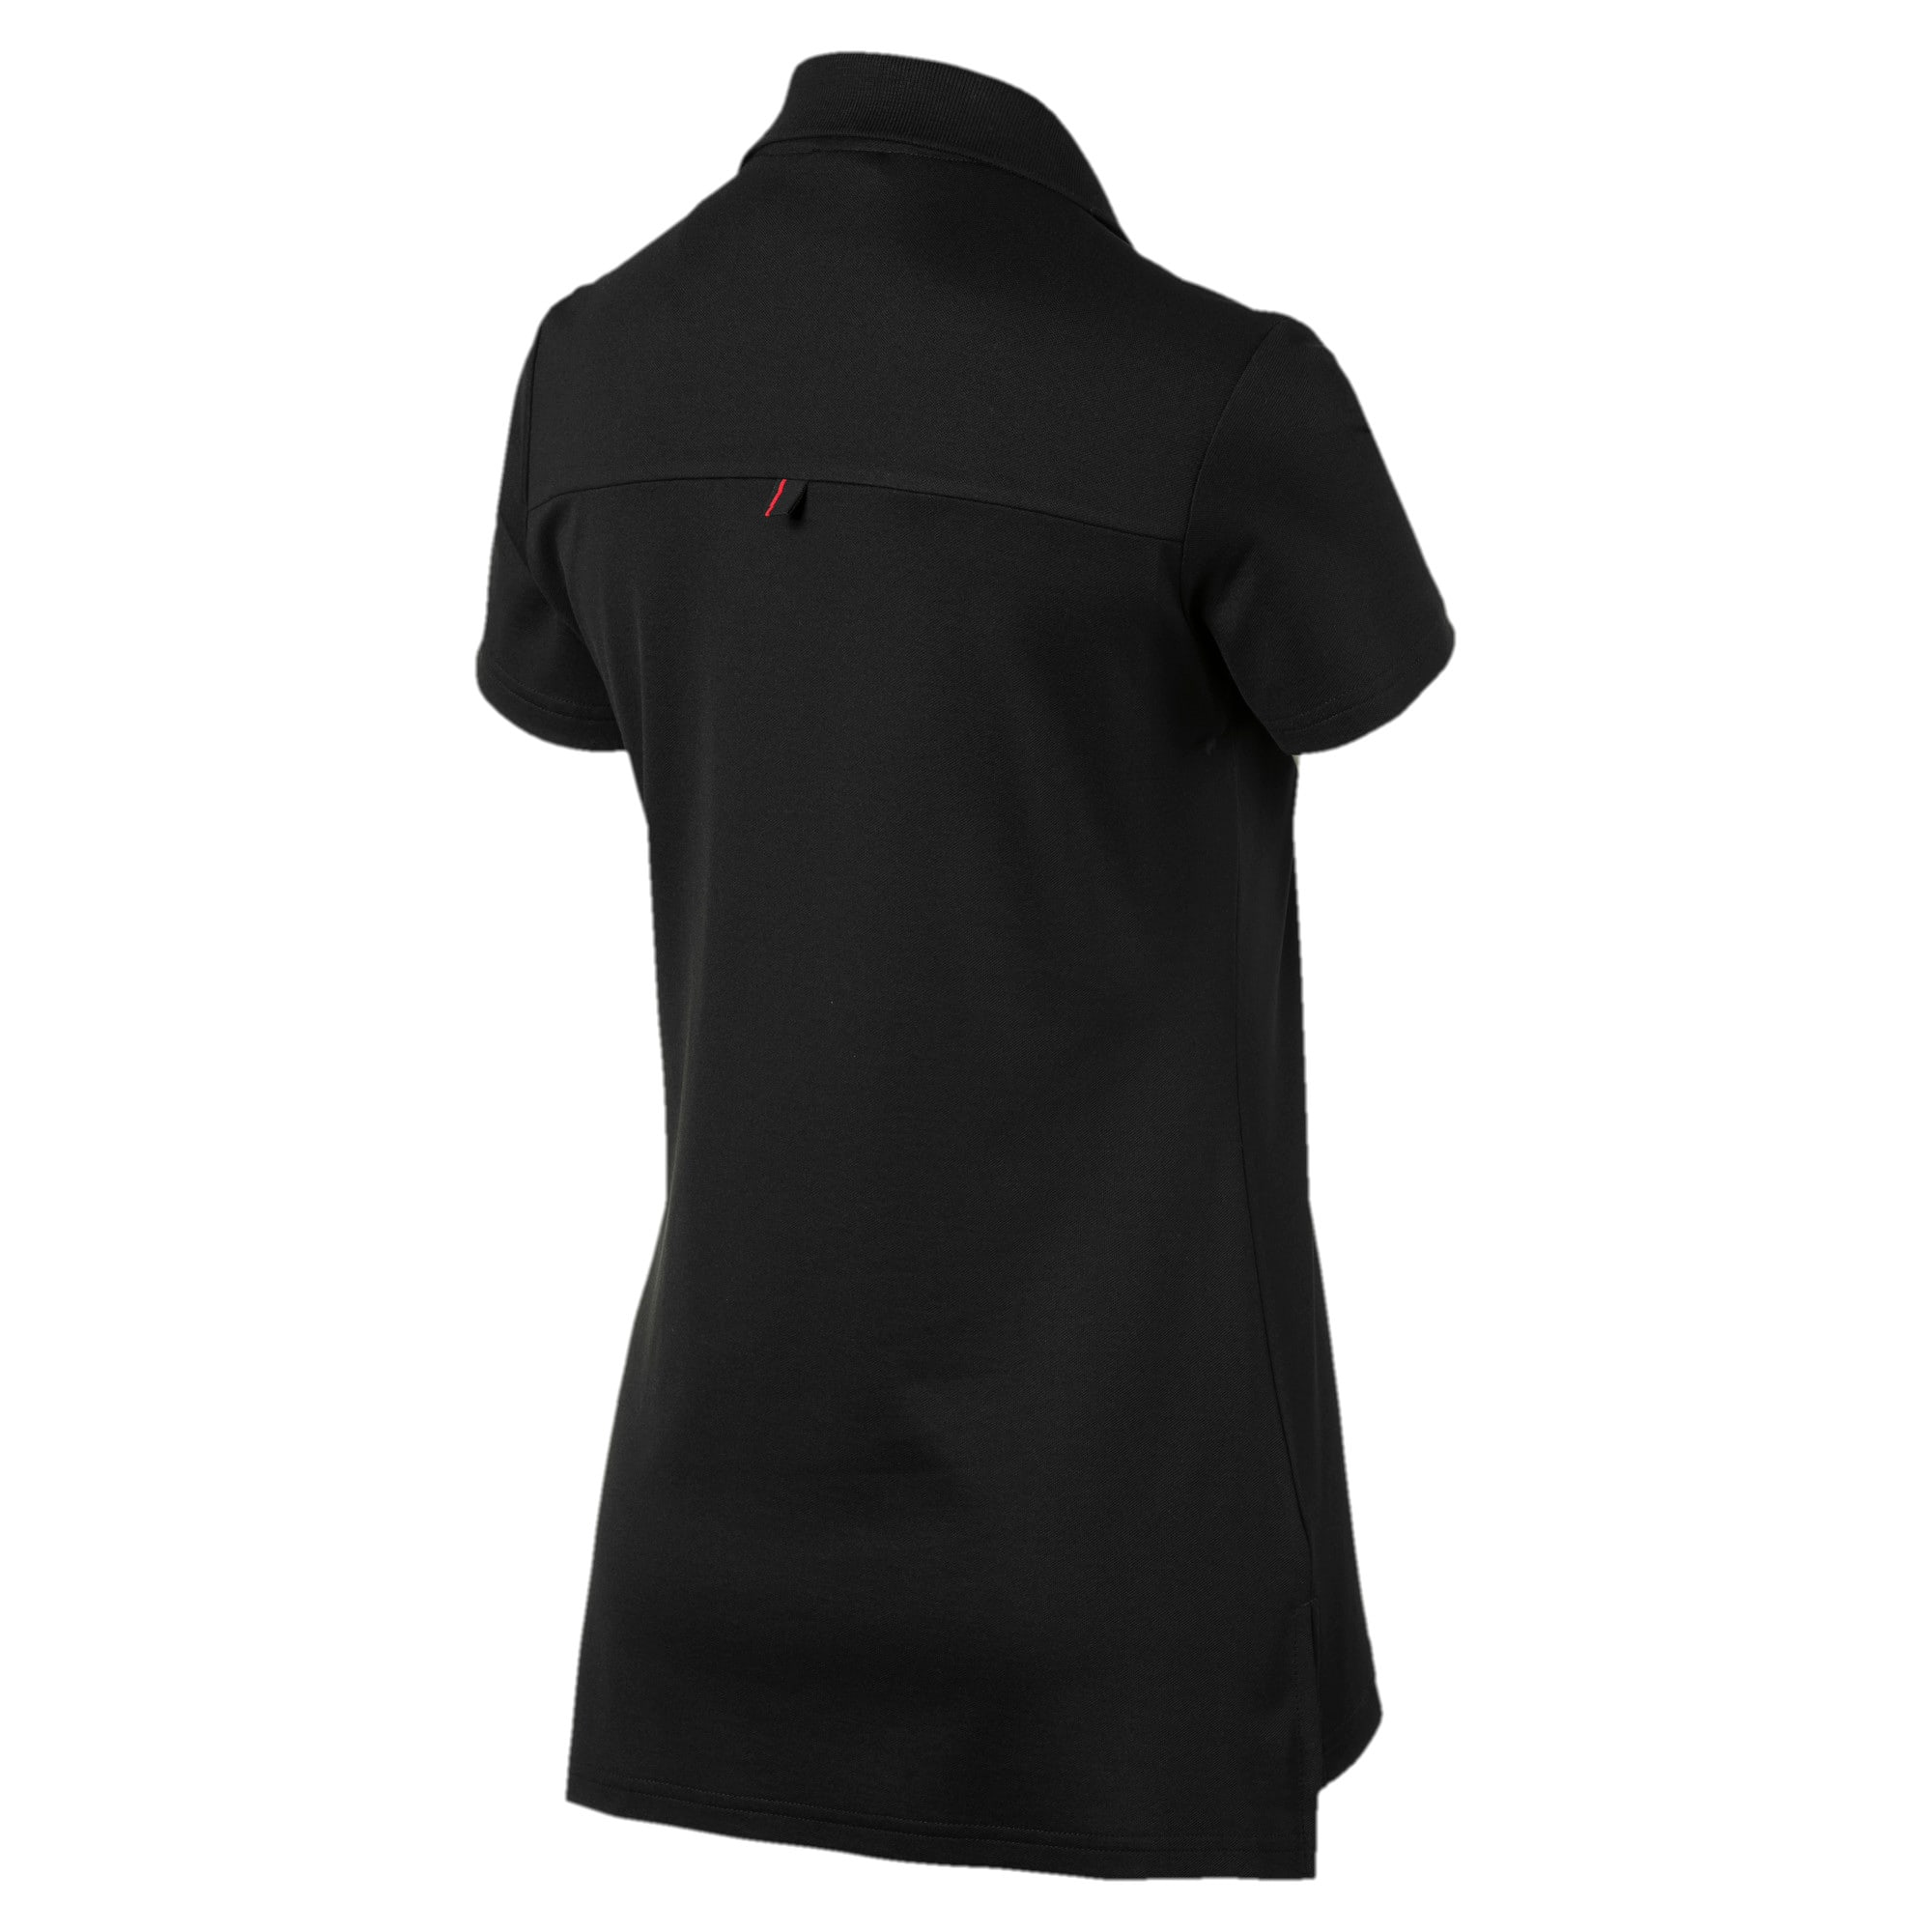 Miniatura 2 de Camiseta tipo polo Scuderia Ferrari para mujer, Puma Black, mediano